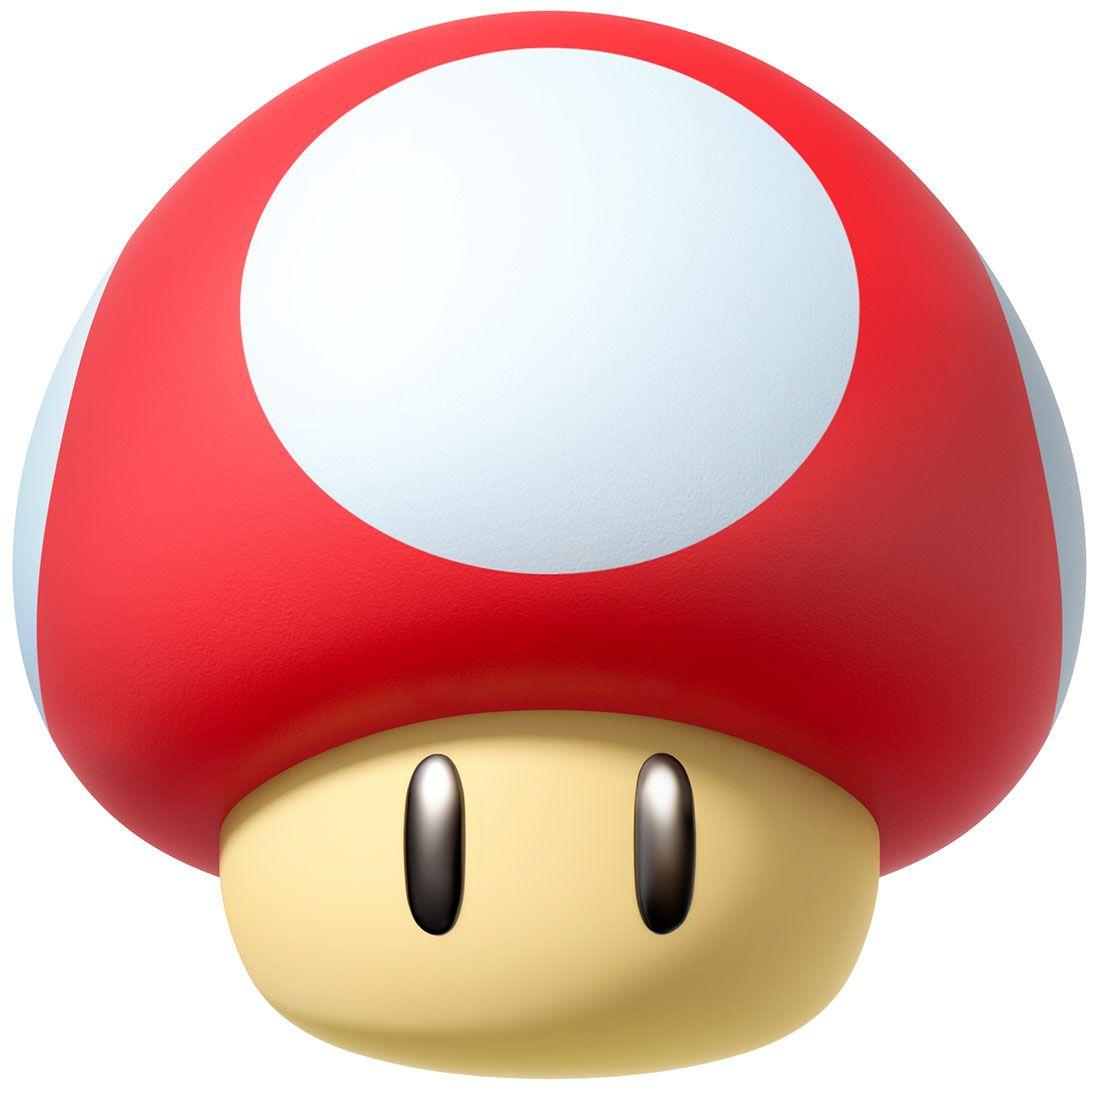 Mushroom Characters Art Mario Kart 8 Mario Kart Mario Bros Party Super Mario Party